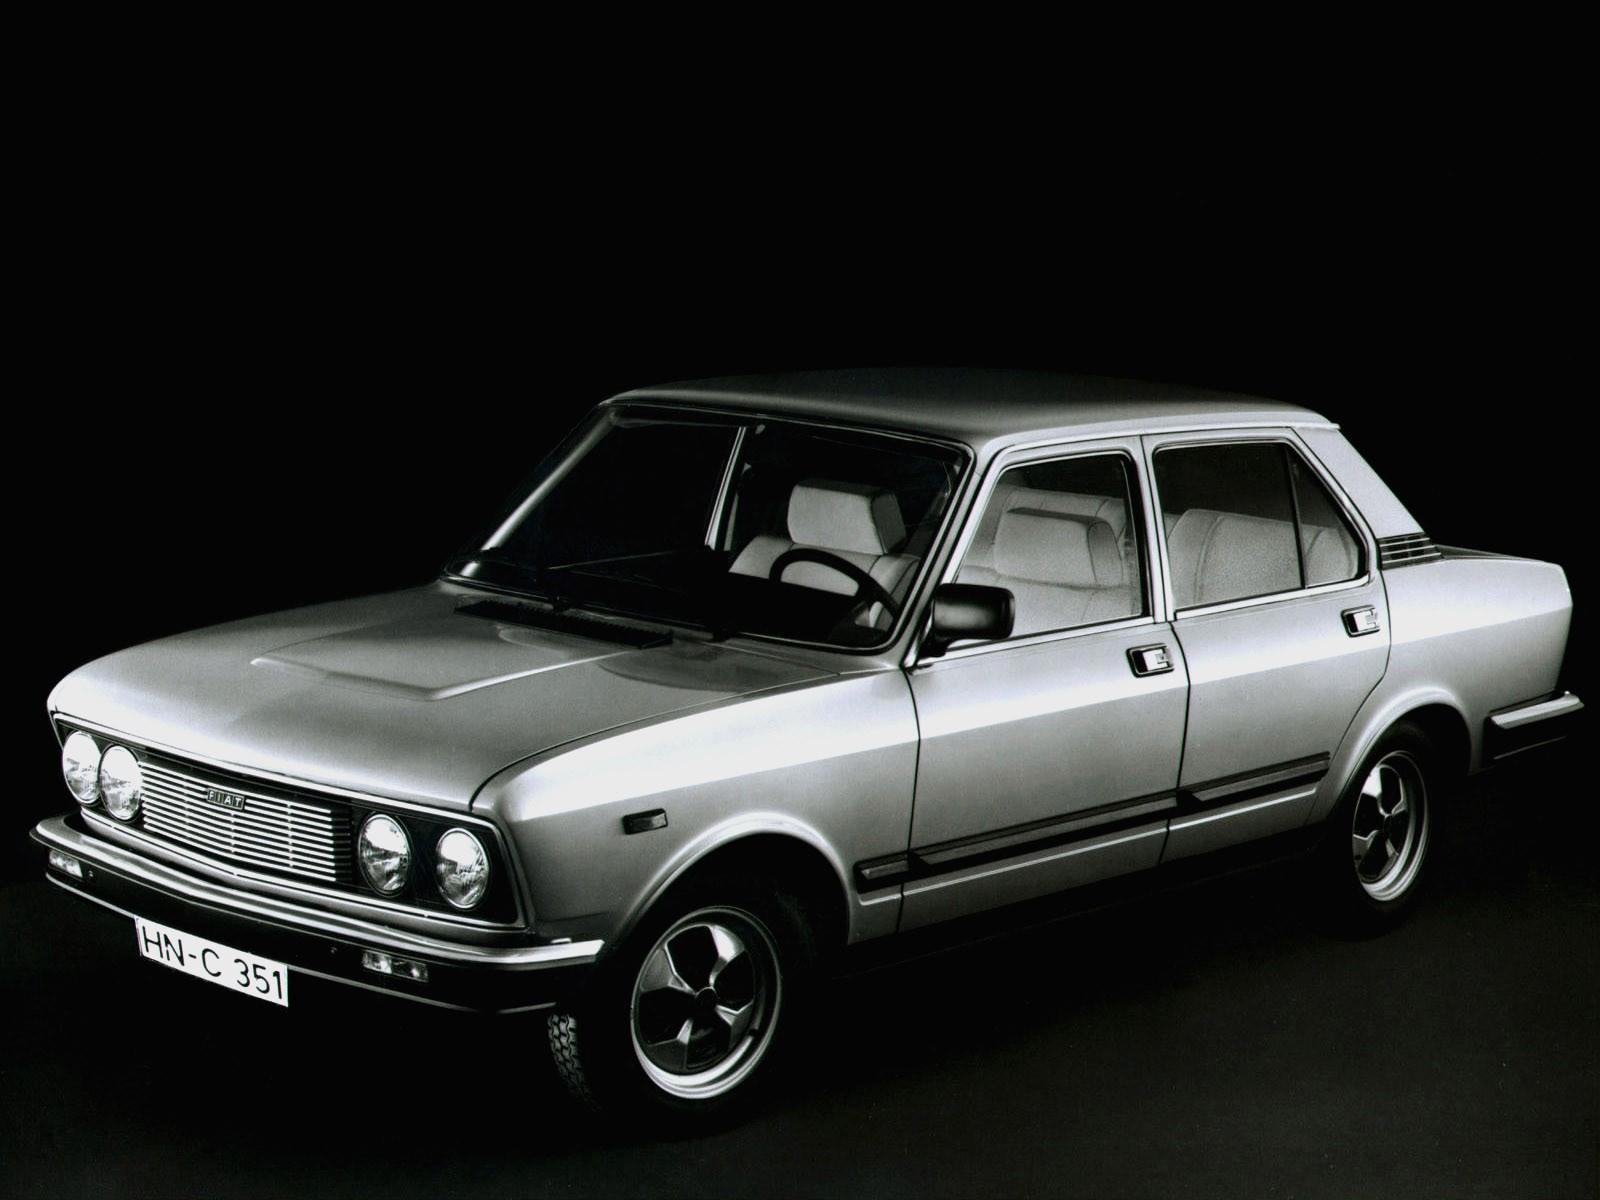 FIAT 132 specs & photos - 1972, 1973, 1974, 1975, 1976 ...